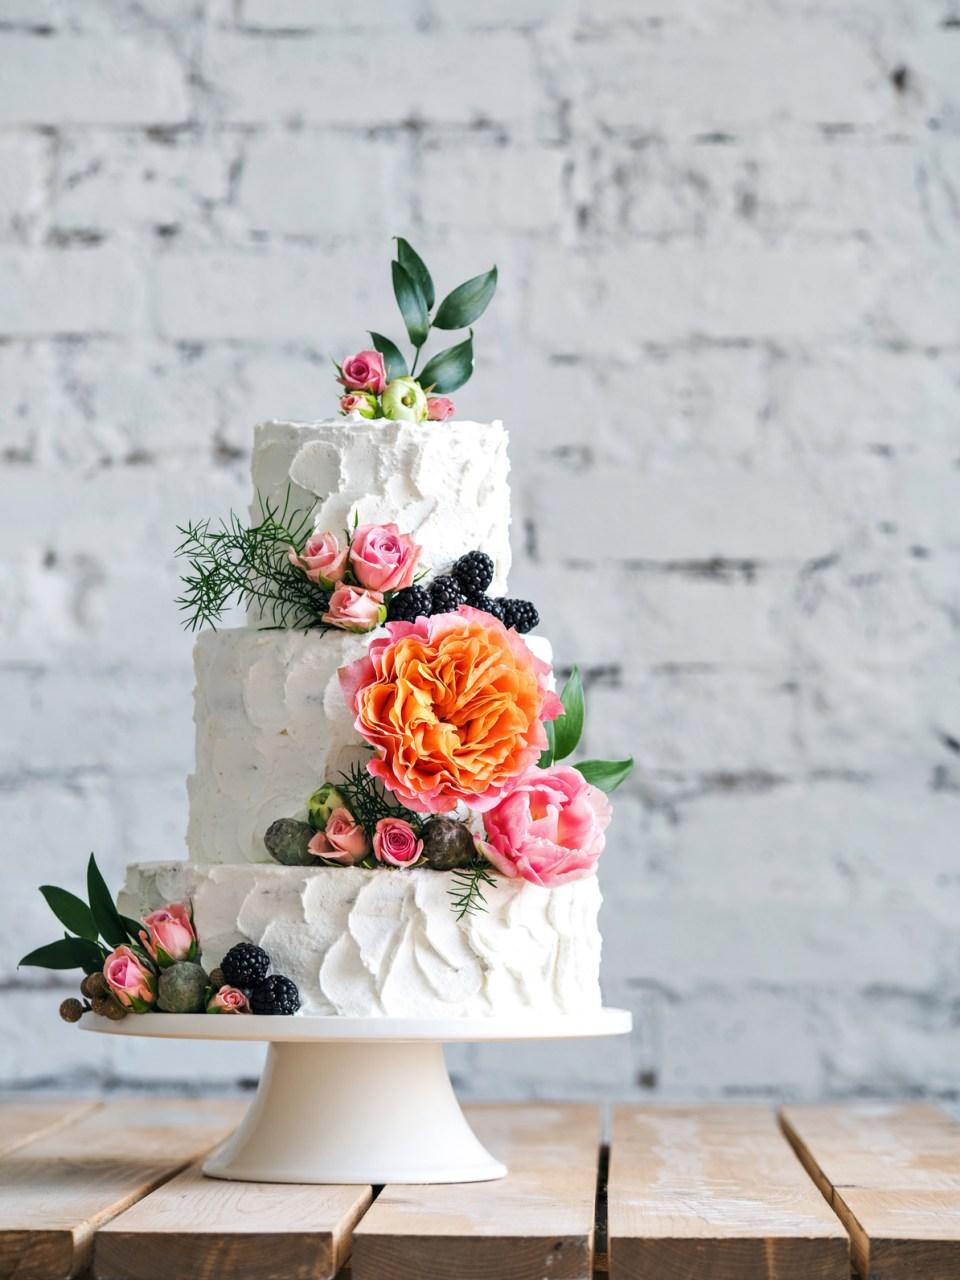 Vibrant Wedding Cake With Greenery